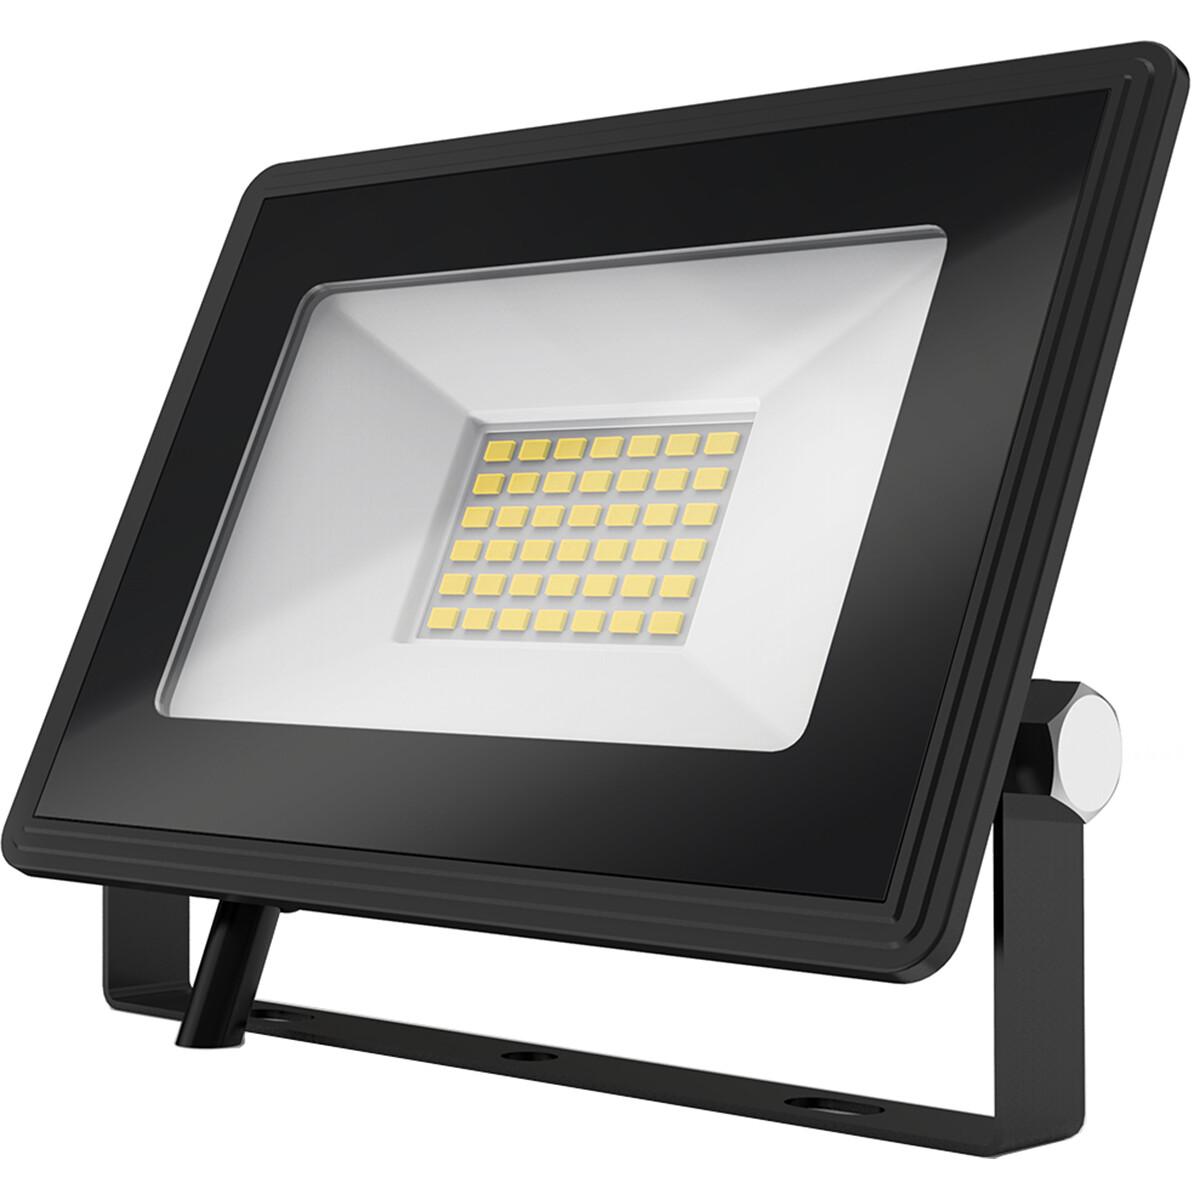 LED Bouwlamp 30 Watt - LED Schijnwerper - Aigi Iglo - Natuurlijk Wit 4000K - Waterdicht IP65 - Mat Zwart - Aluminium